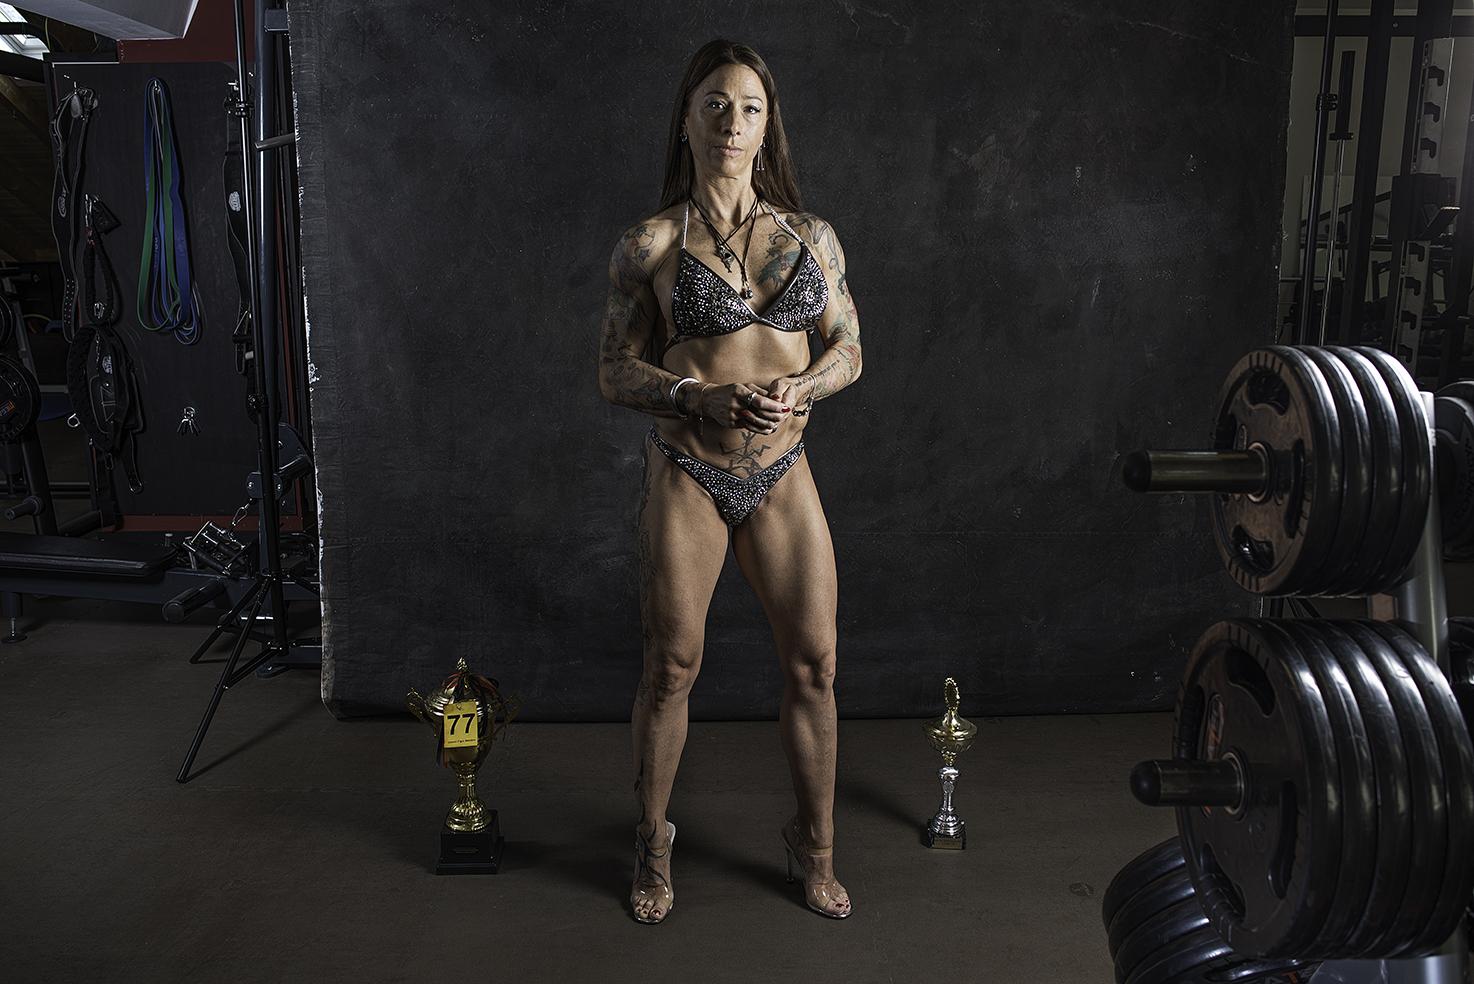 Manuela Sauter